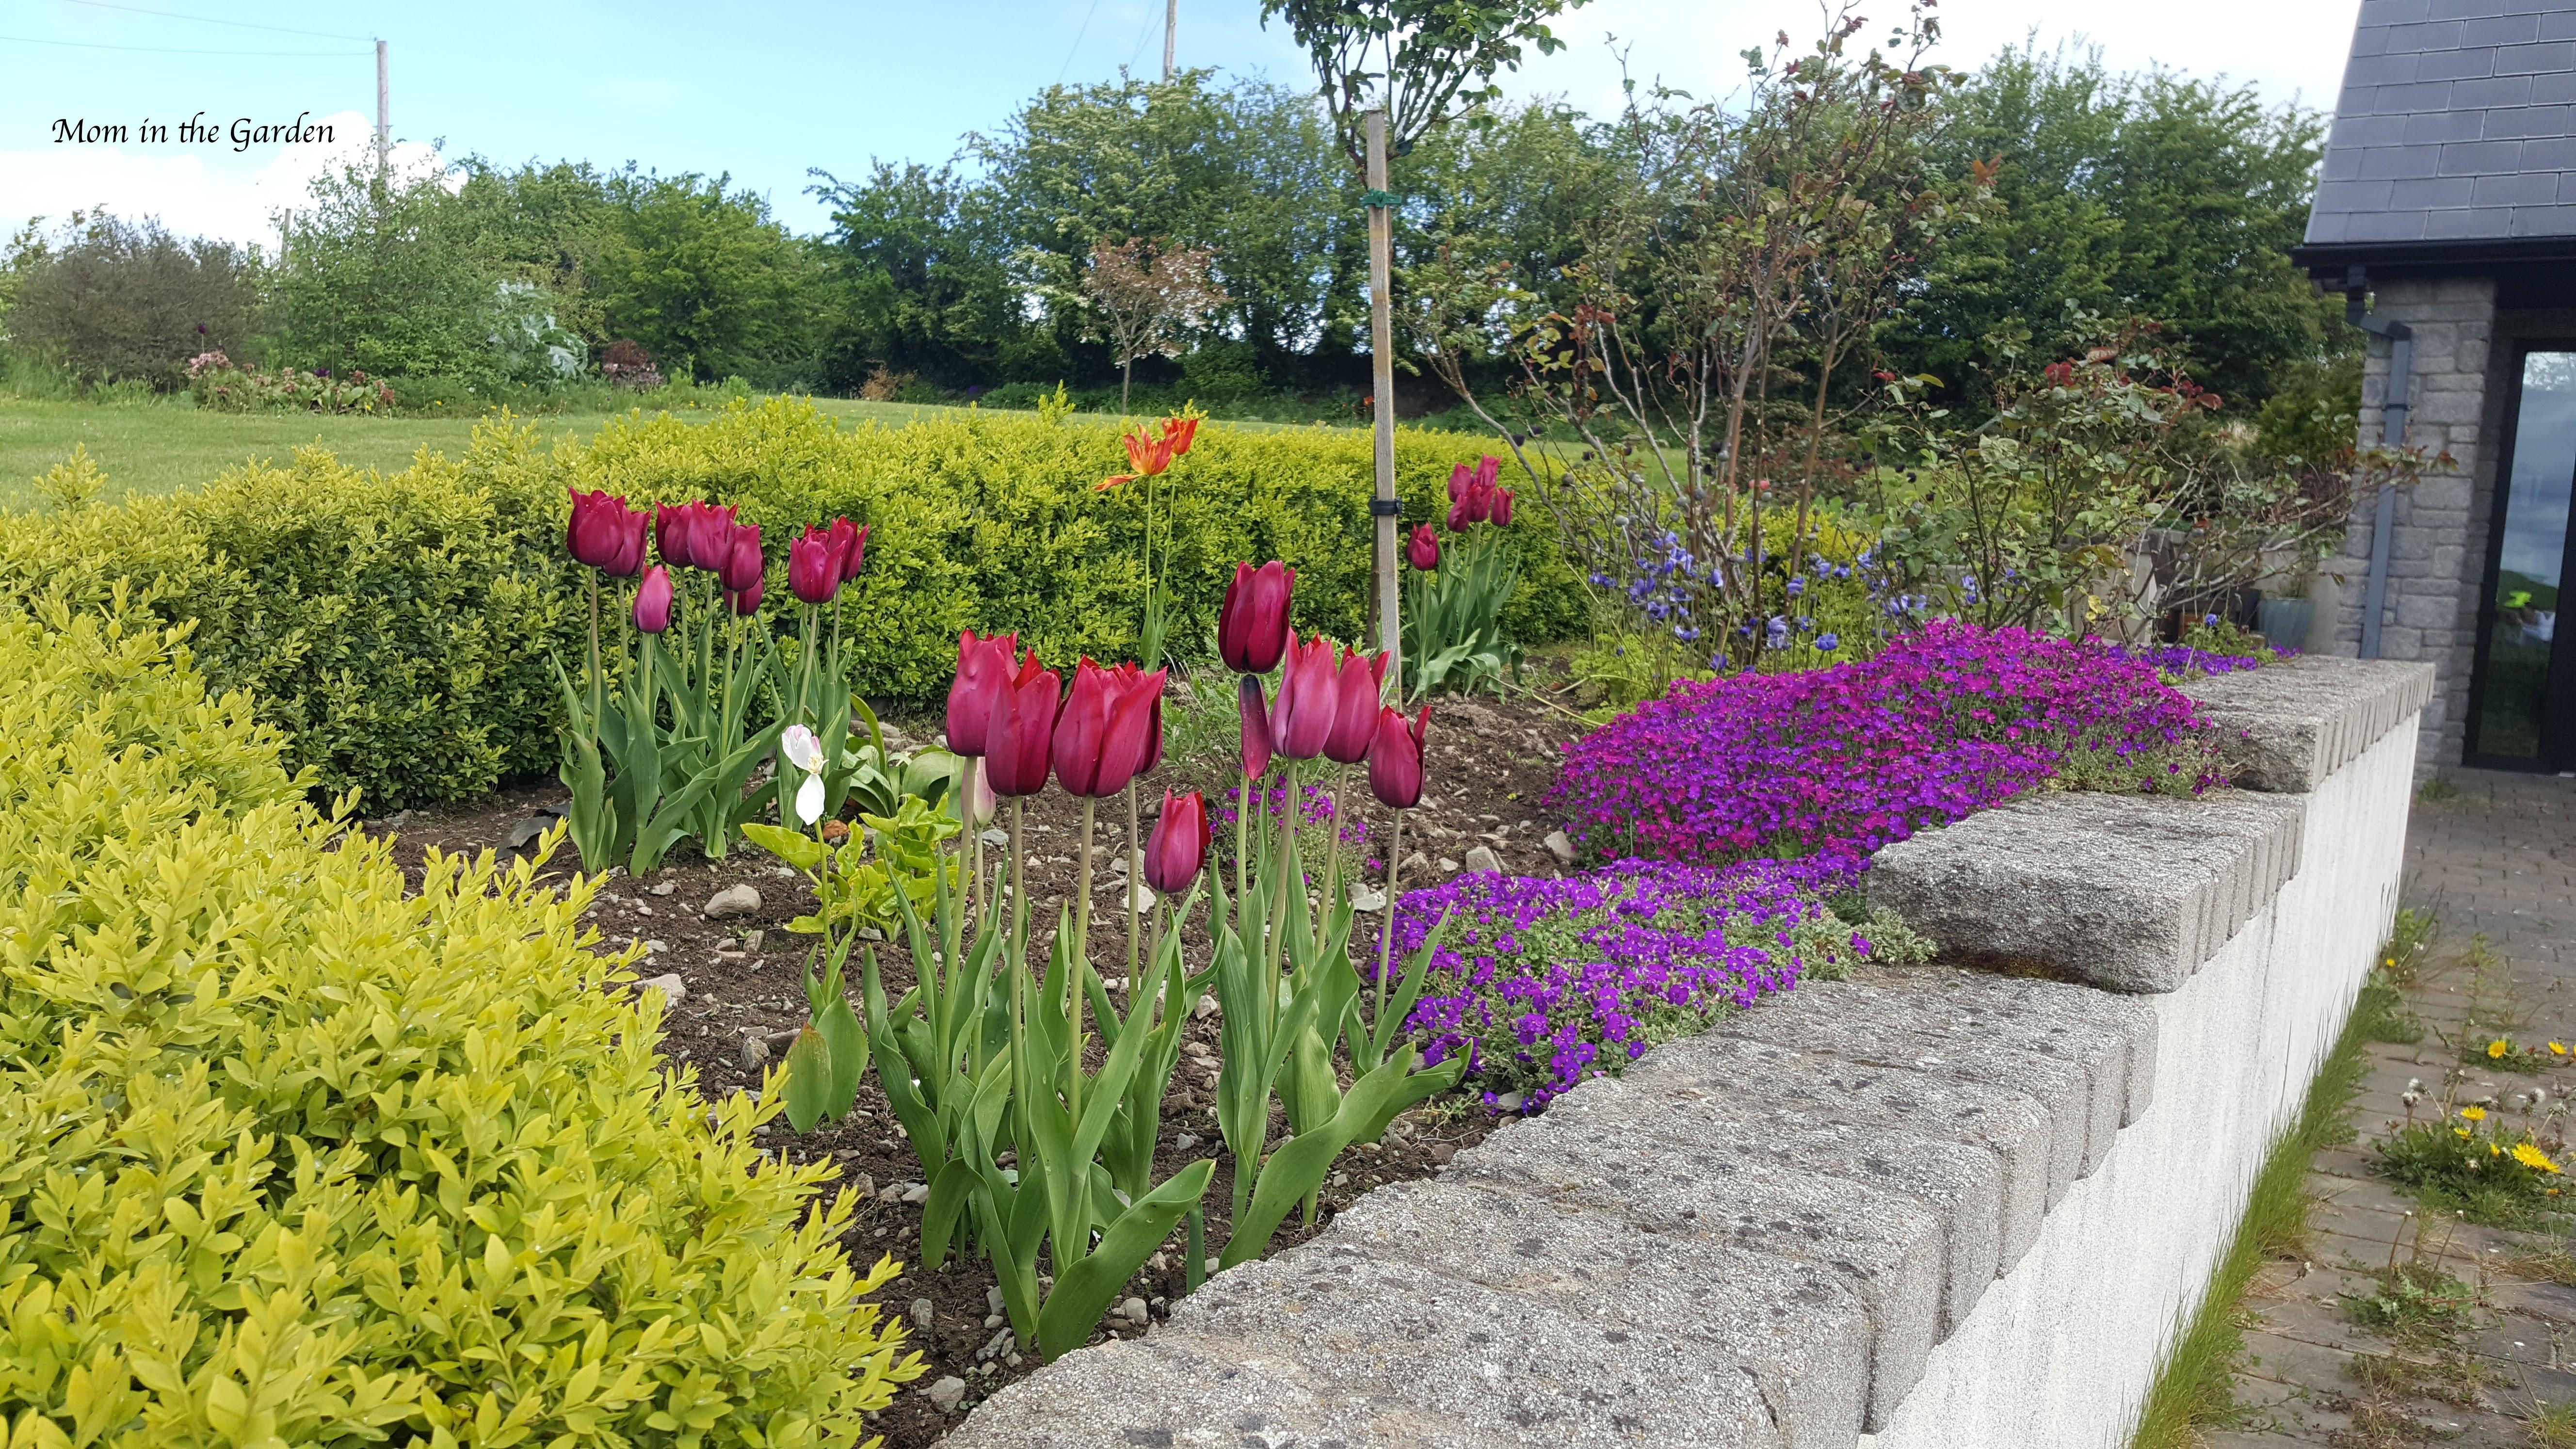 Merlot tulips